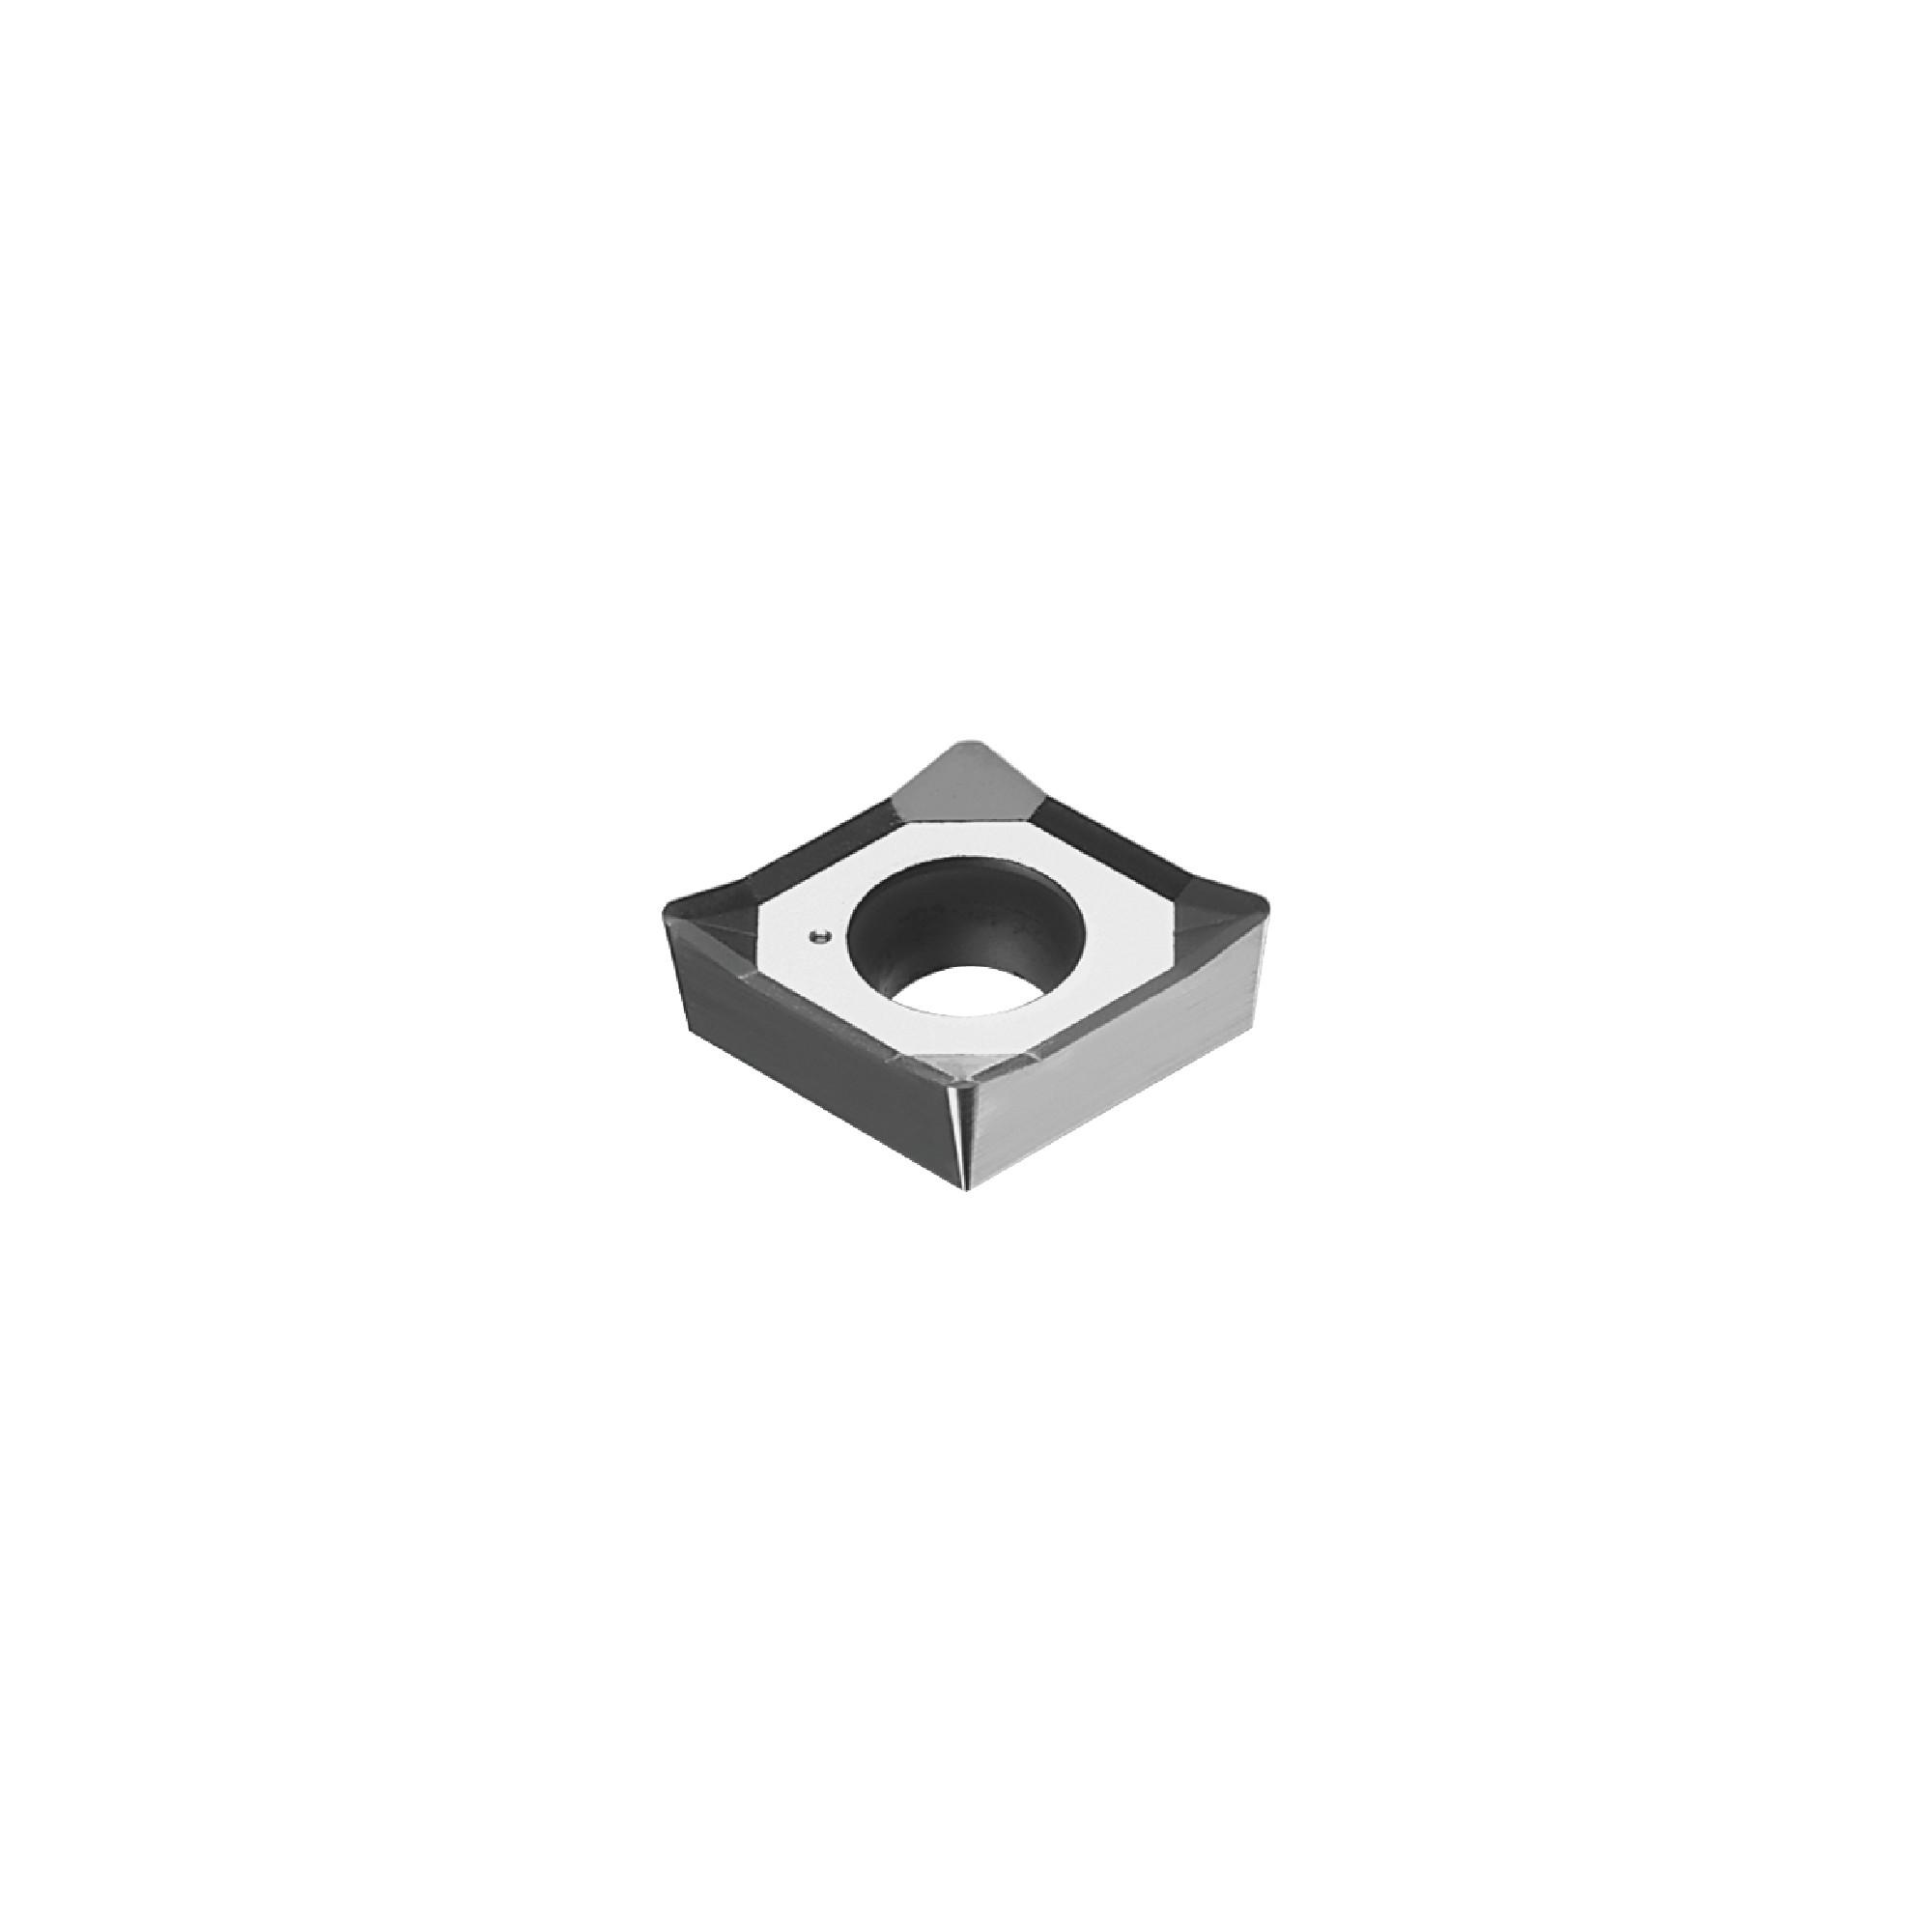 ARNO - CCGT2(1.5)0.5FN-ALU AK10 - 80° Diamond / Indexable Carbide Turning Insert